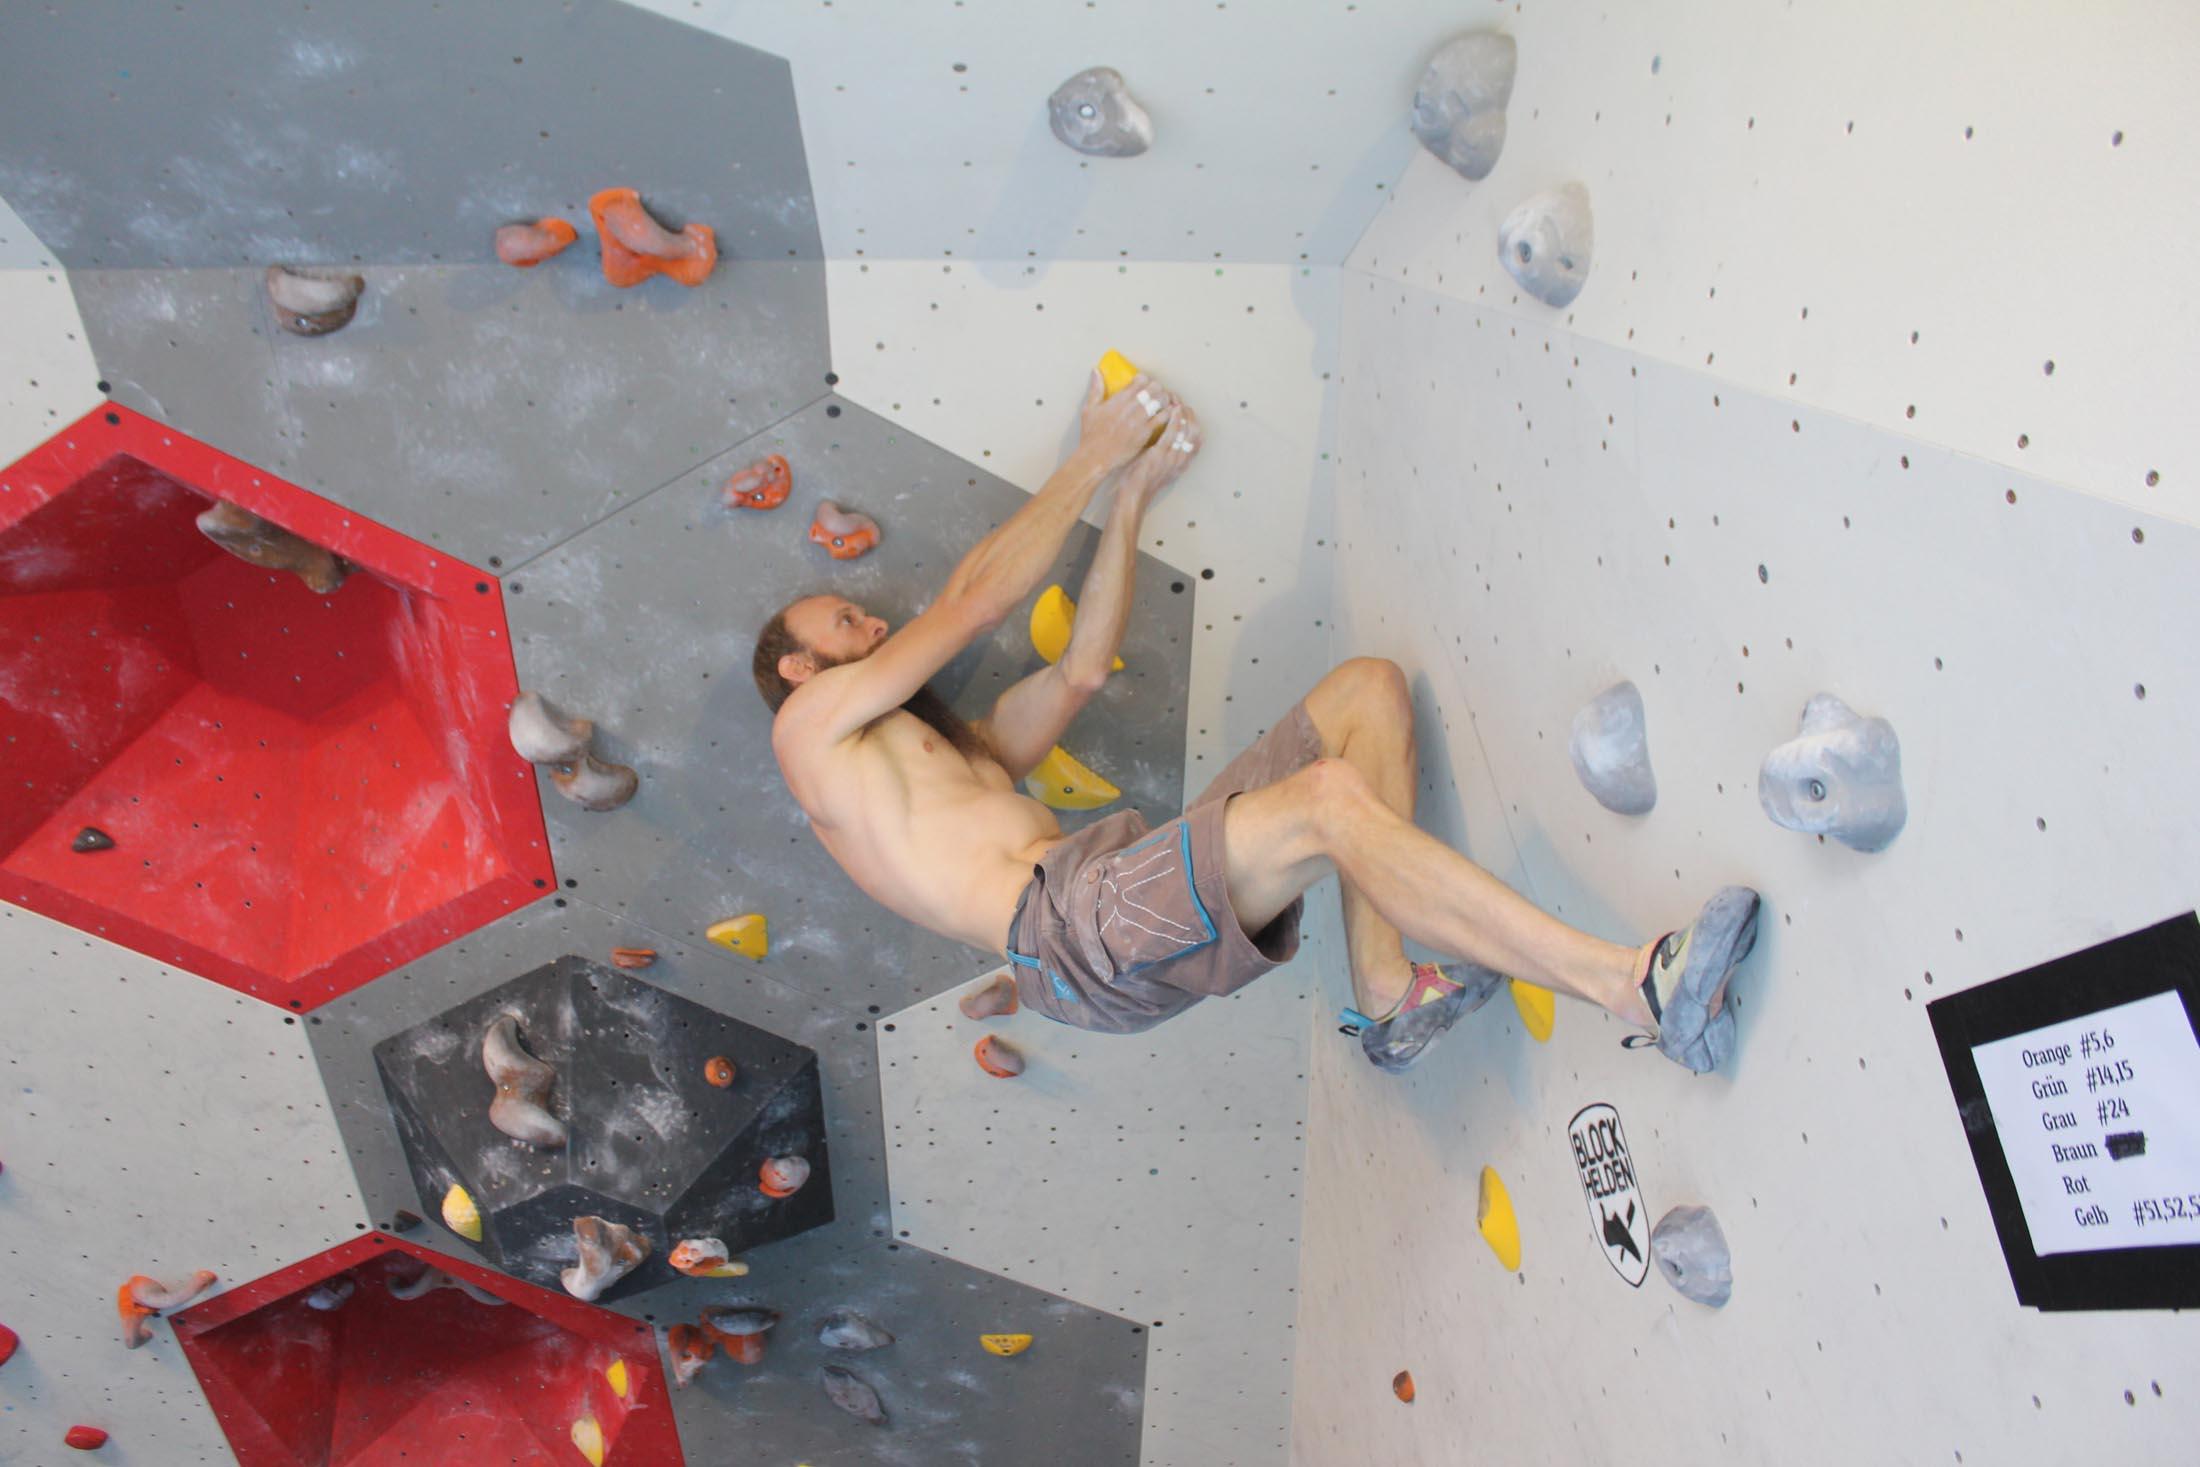 Quali, internationaler bouldercup Frankenjura 2016, BLOCKHELDEN Erlangen, Mammut, Bergfreunde.de, Boulderwettkampf07092016326